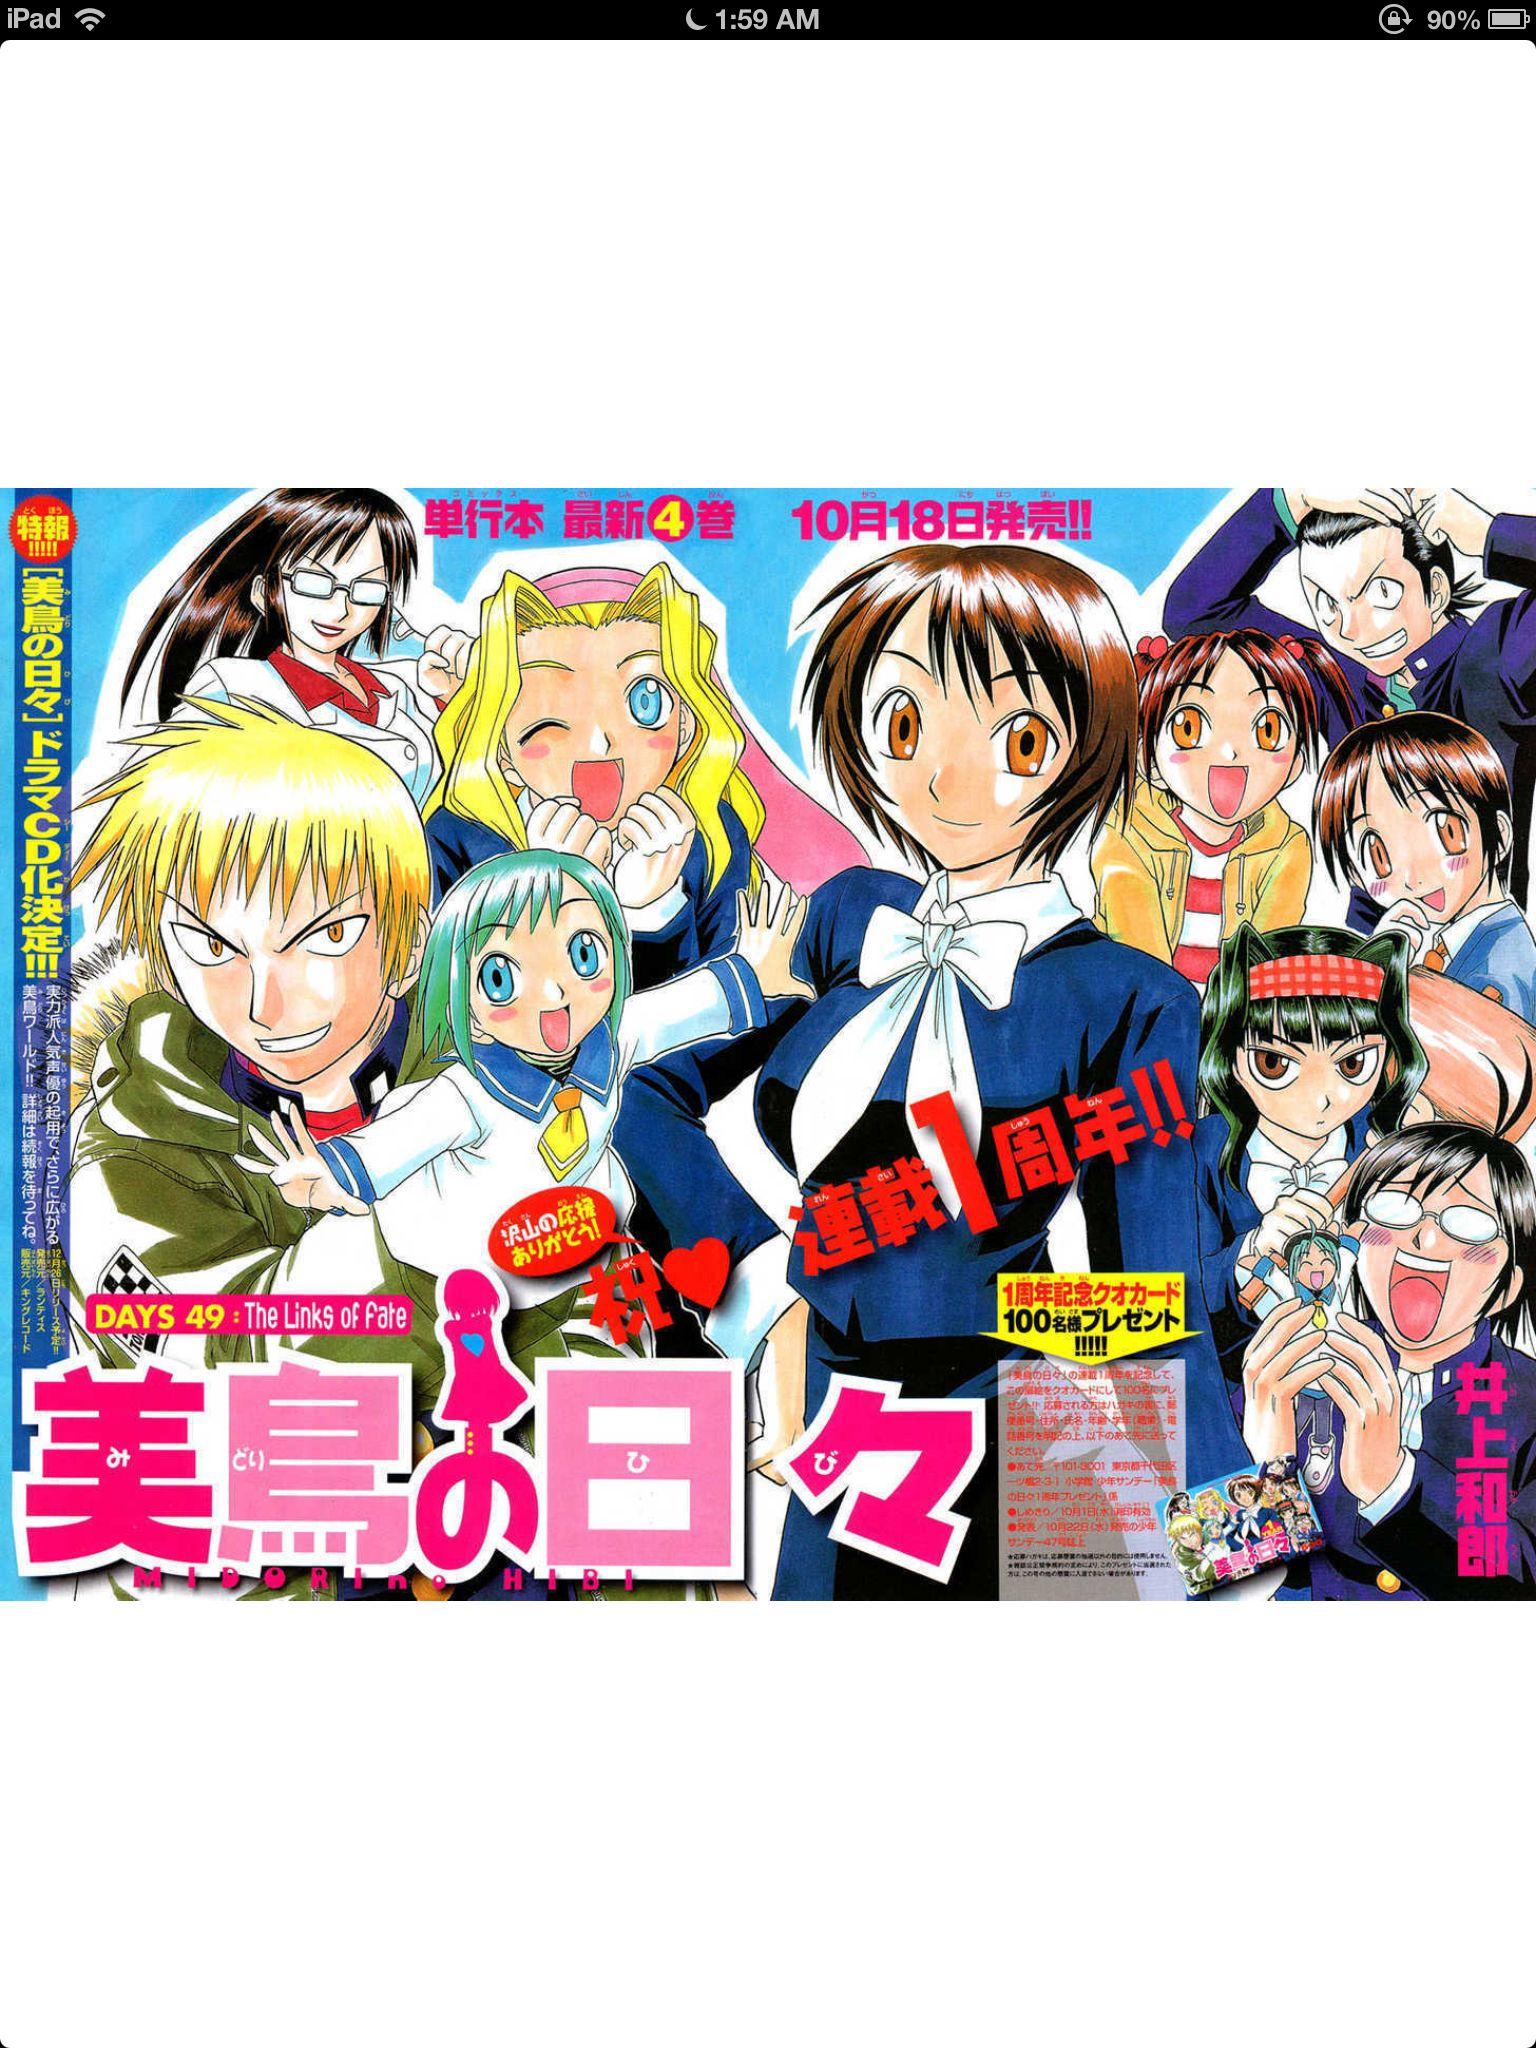 Midori Days Anime, Midori, Zelda characters